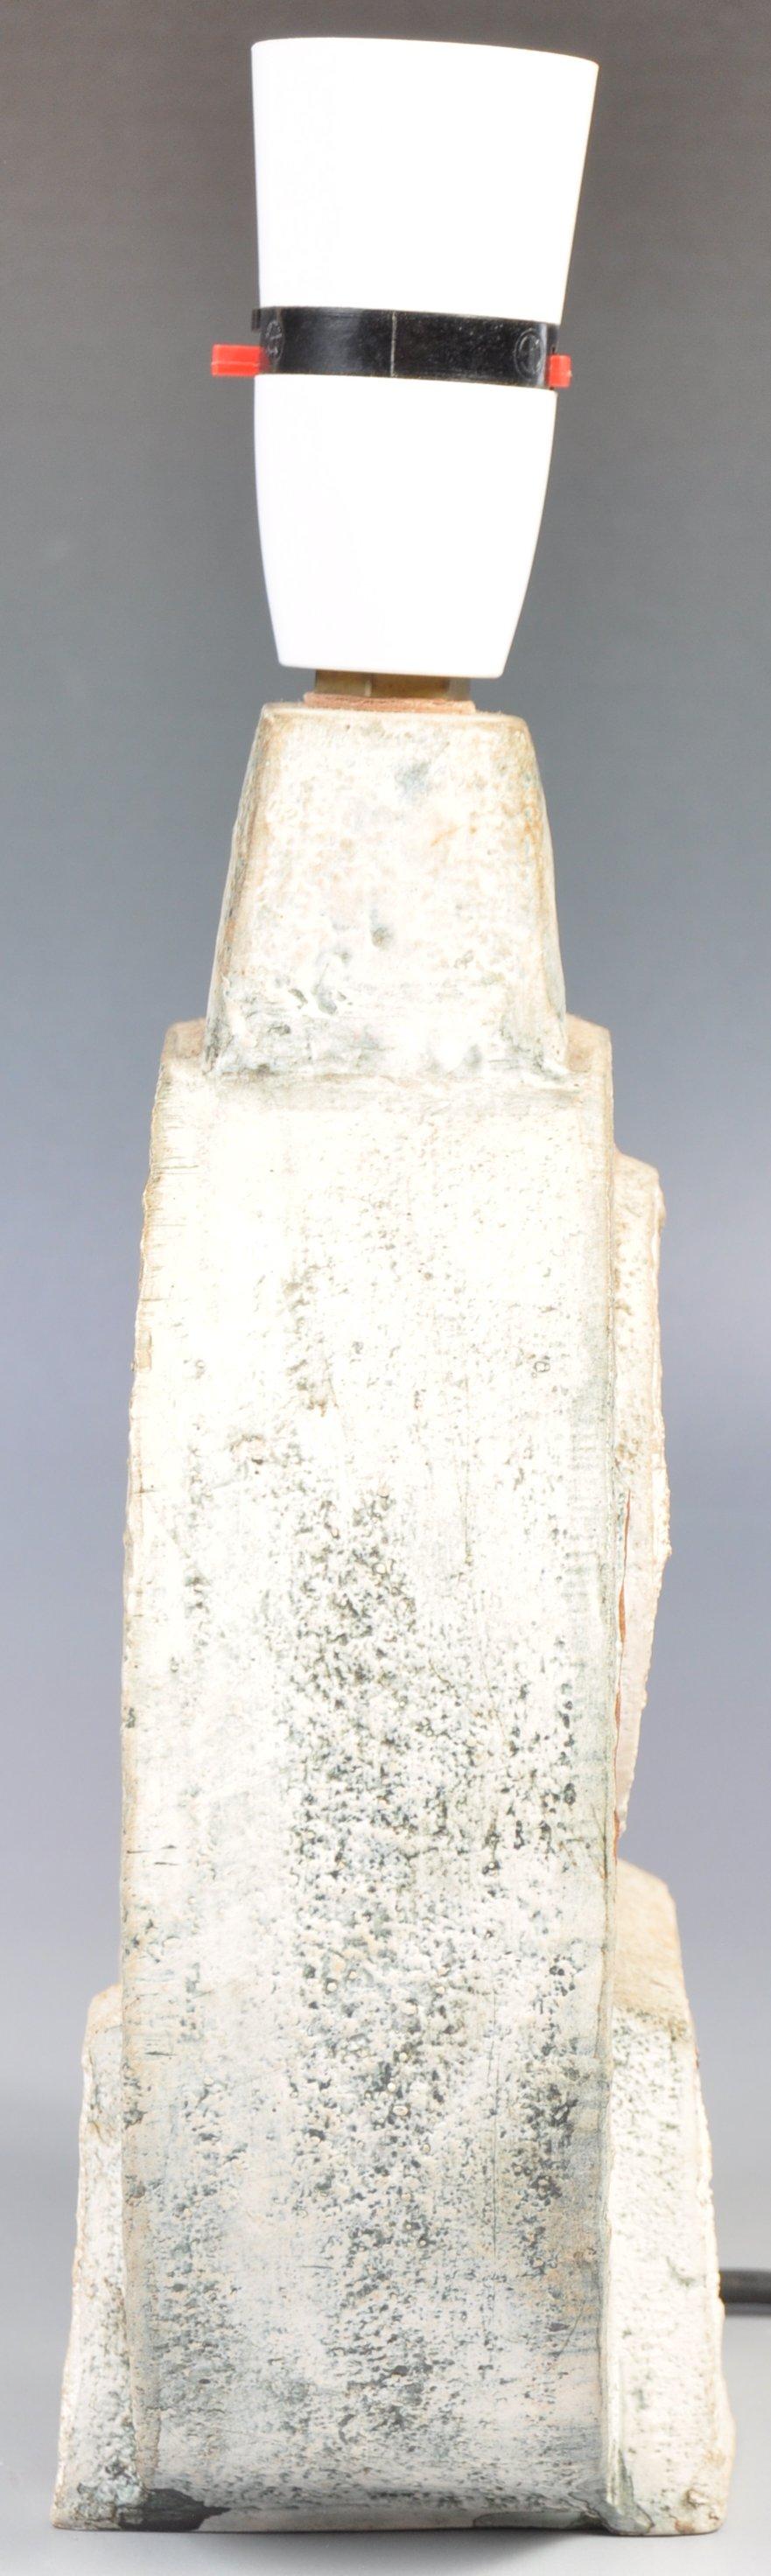 SIMONE KILBURN WHEEL VASE LAMP BY TROIKA - Image 3 of 6